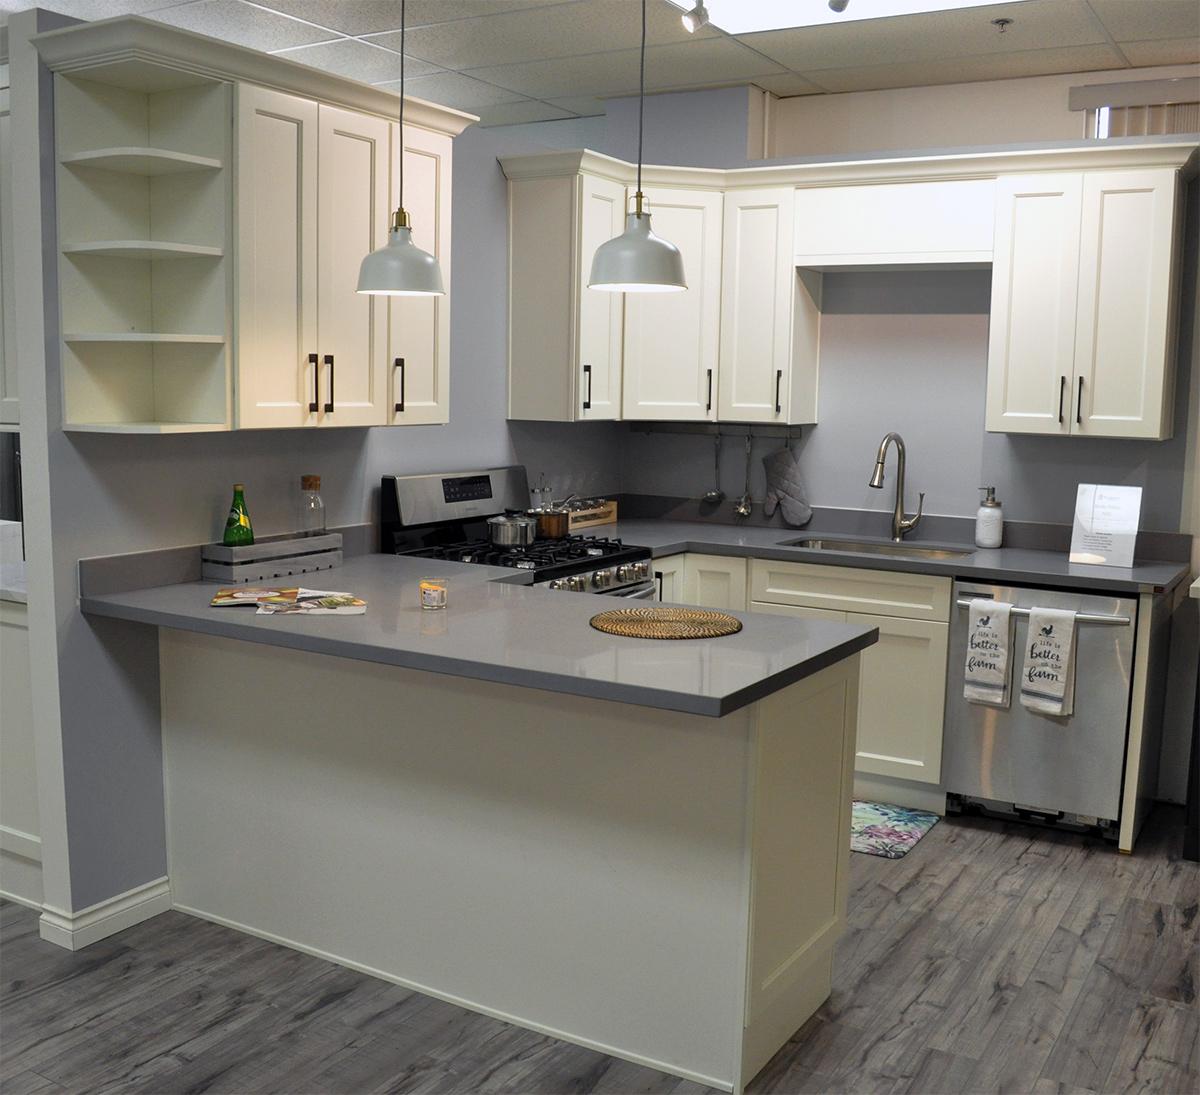 Showroom  A1 Cabinets  Granite